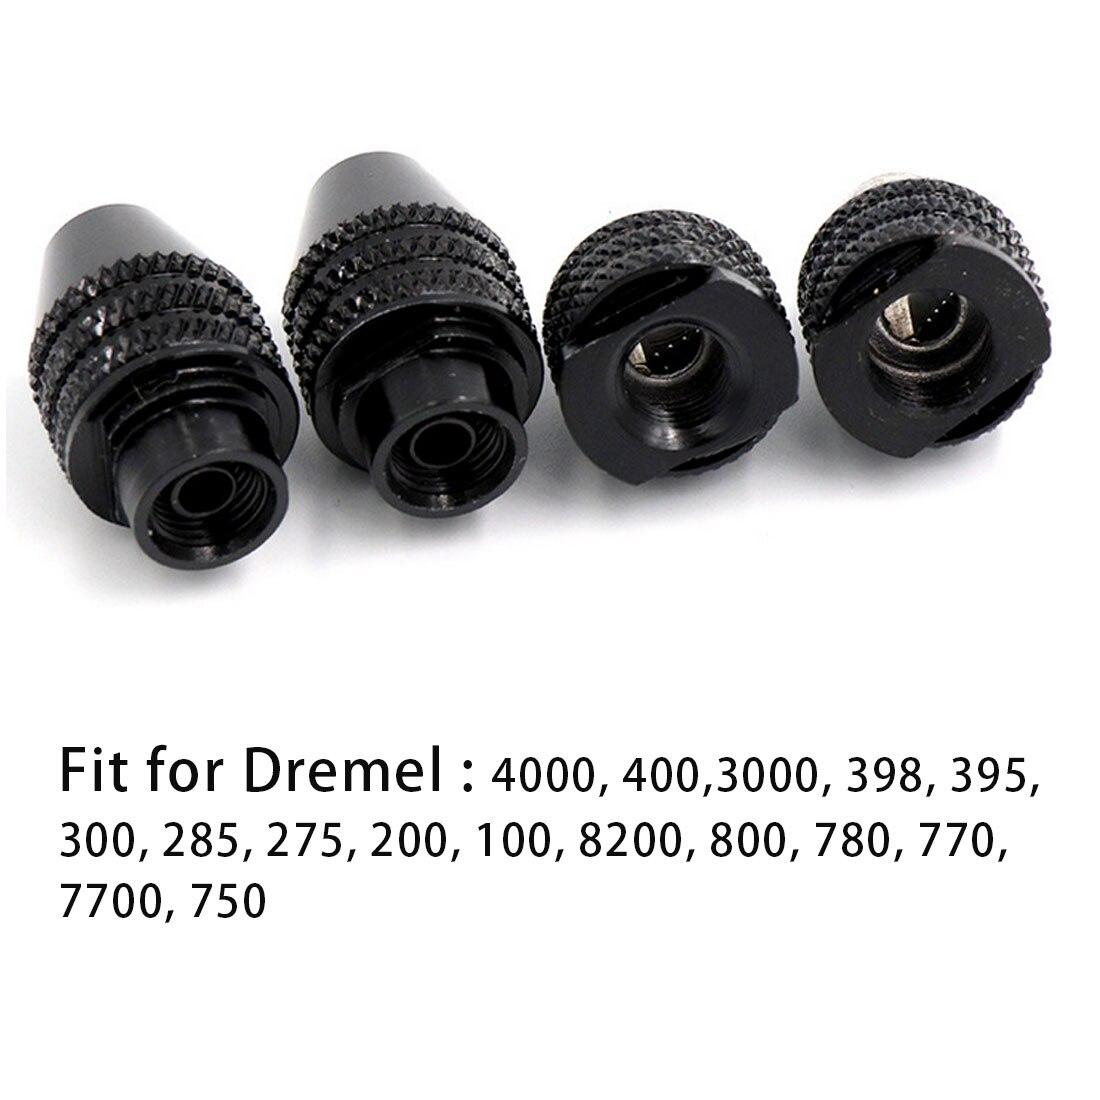 1Pcs 0.4-3.2MM Chuck Bit for Dremel 3000 4000 398 285 200 800 Rotary Tools